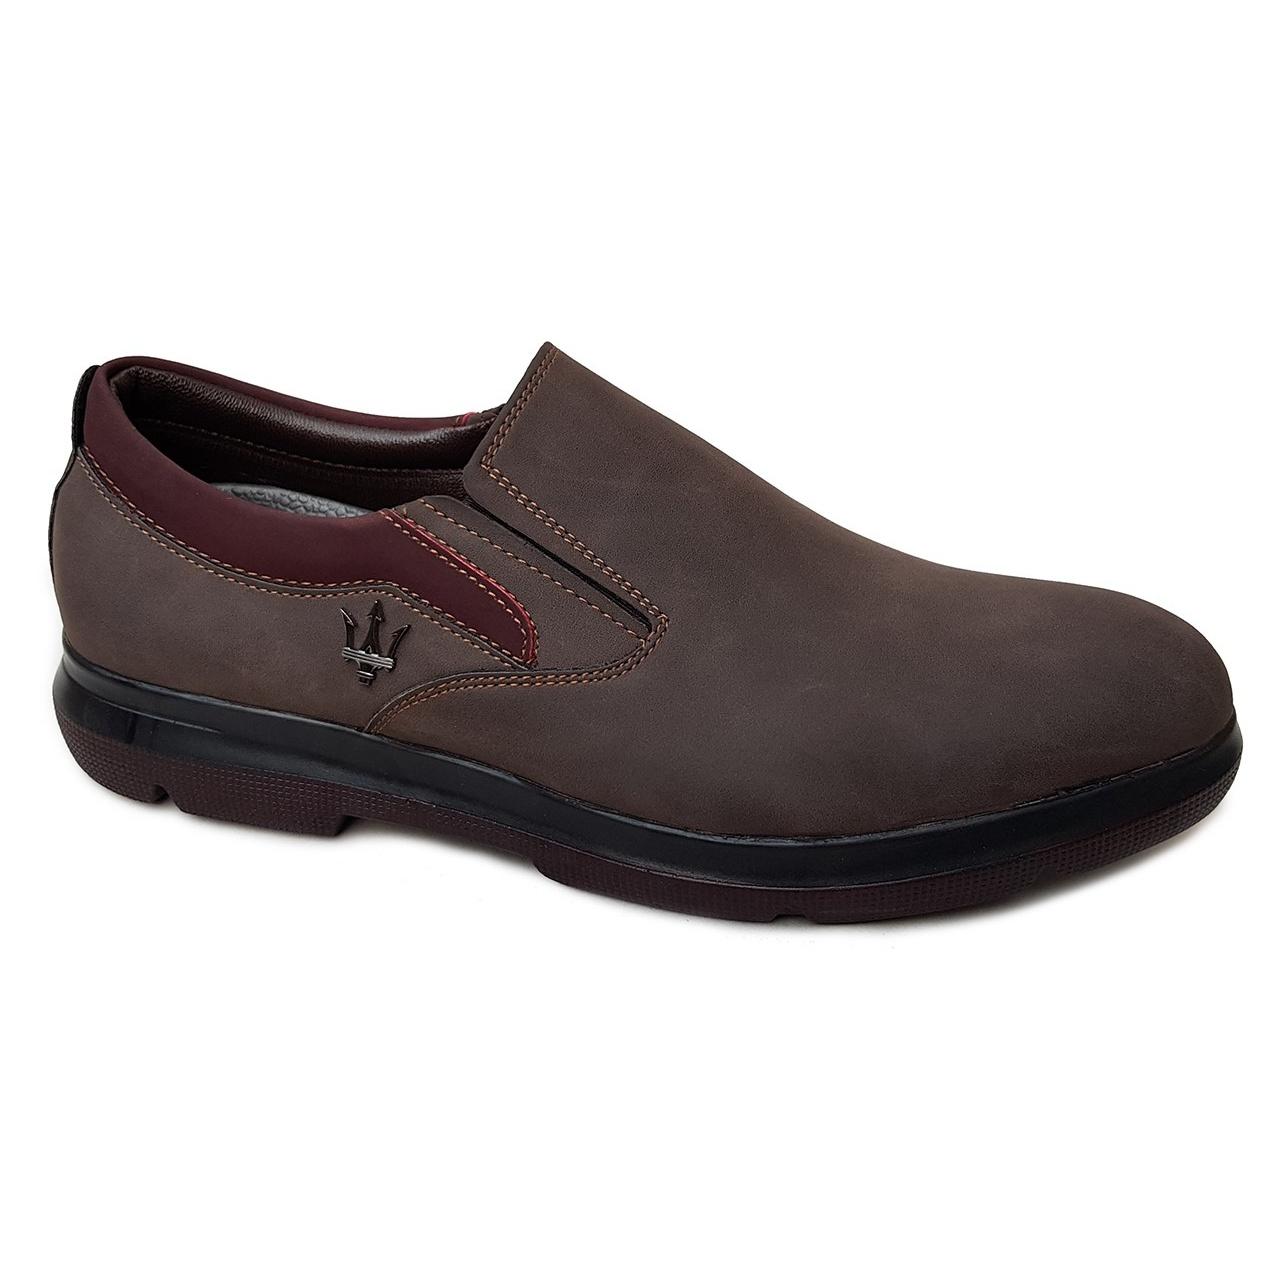 کفش مردانه چرم طبیعی دیاکو مدلMSL-BARSELON-K-BROWN